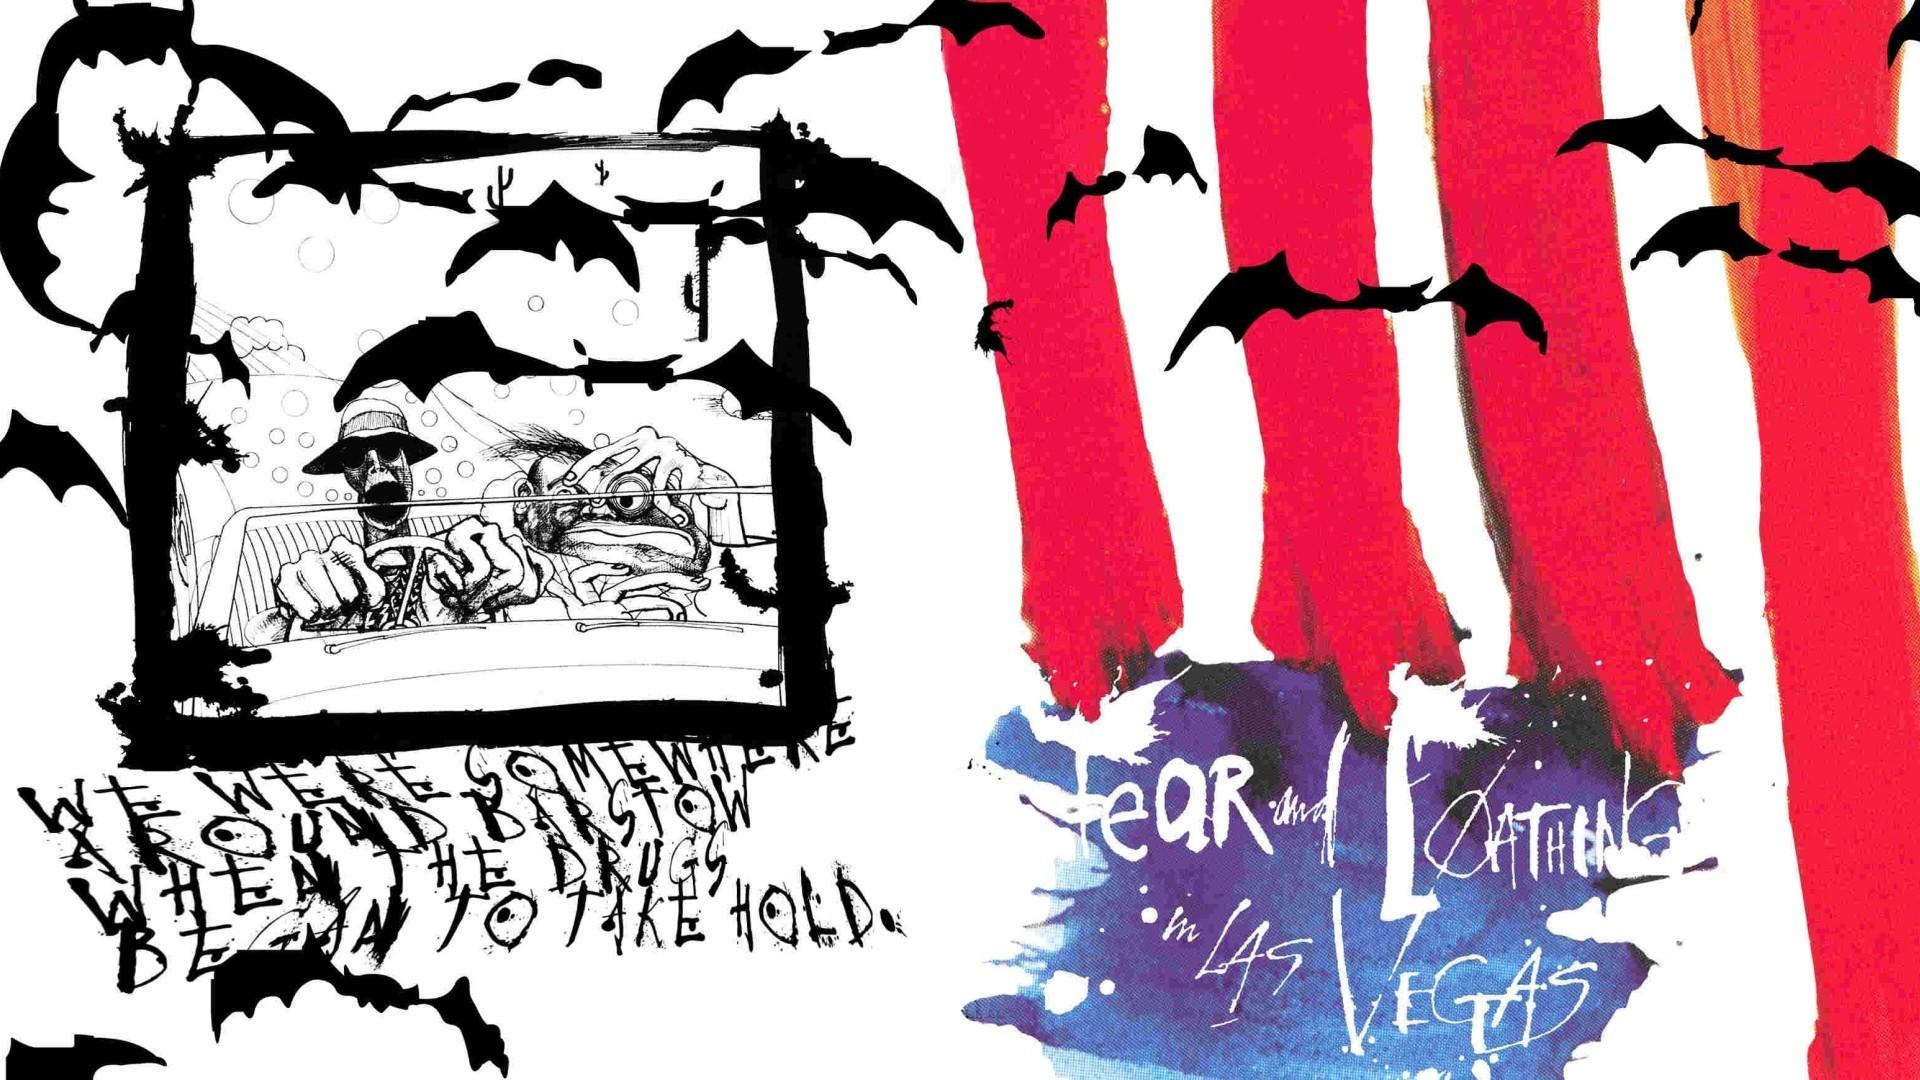 Wallpaper 1920x1080 Px Artwork Fear And Loathing In Las